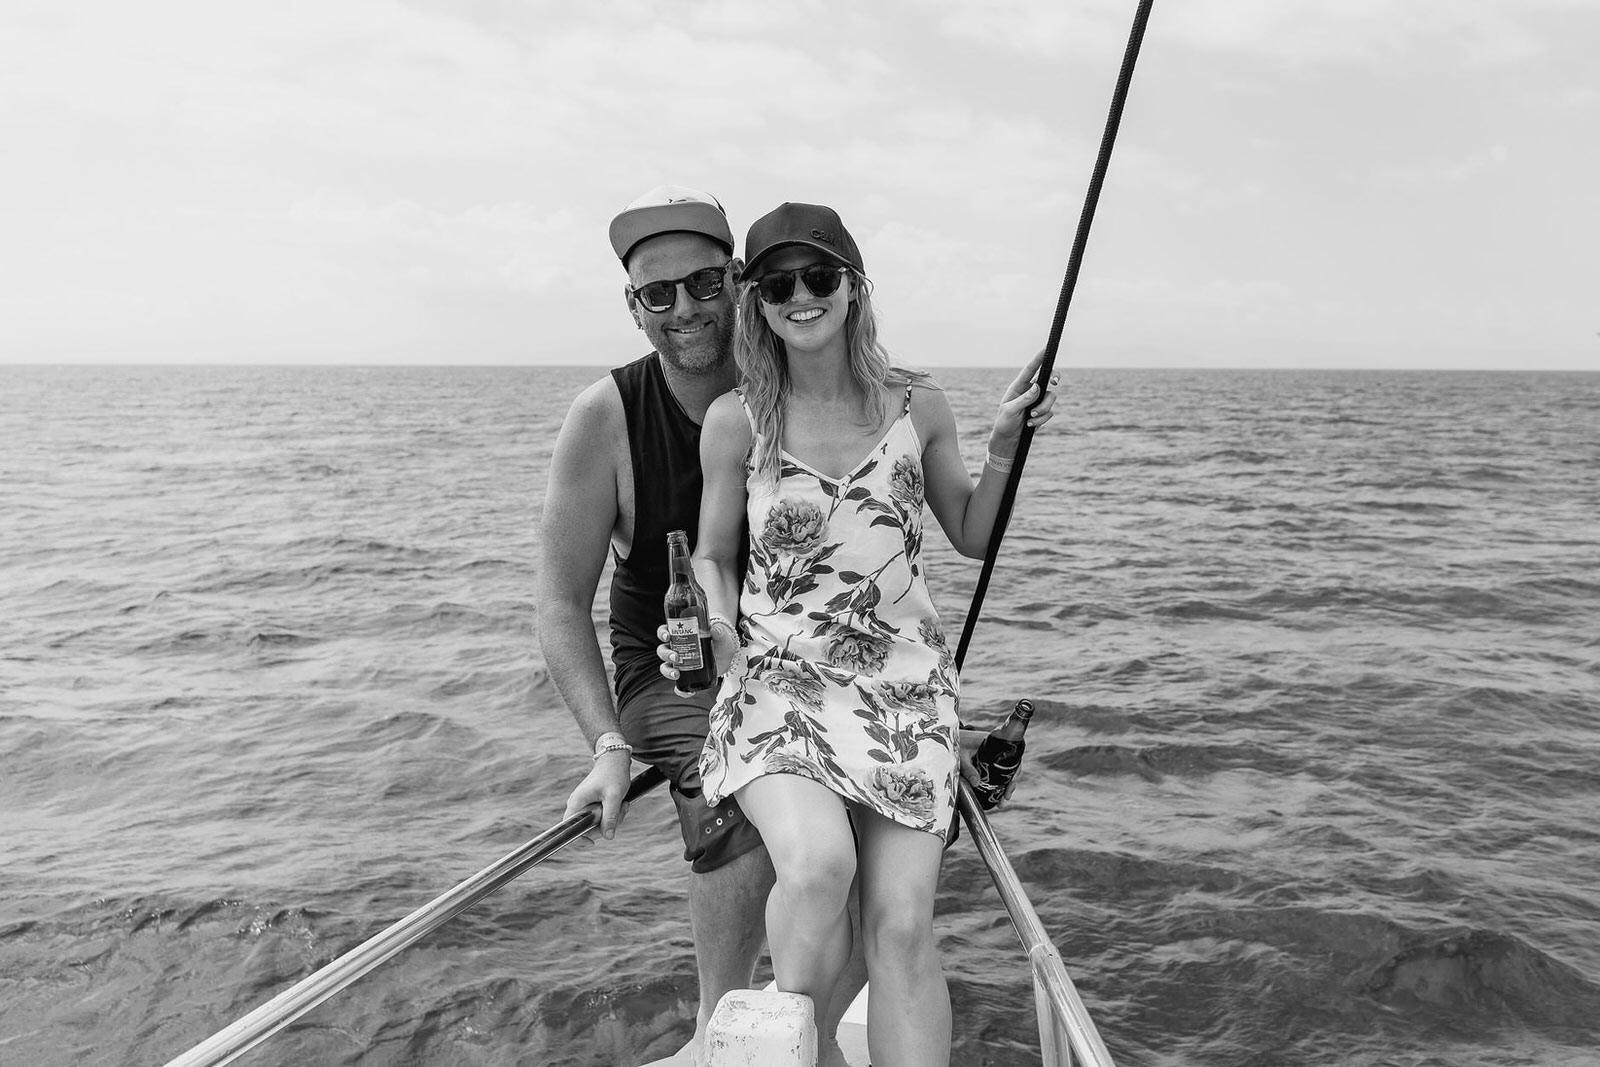 newfound-hai-tide-nusa-lembongan-bali-wedding-photographers-010